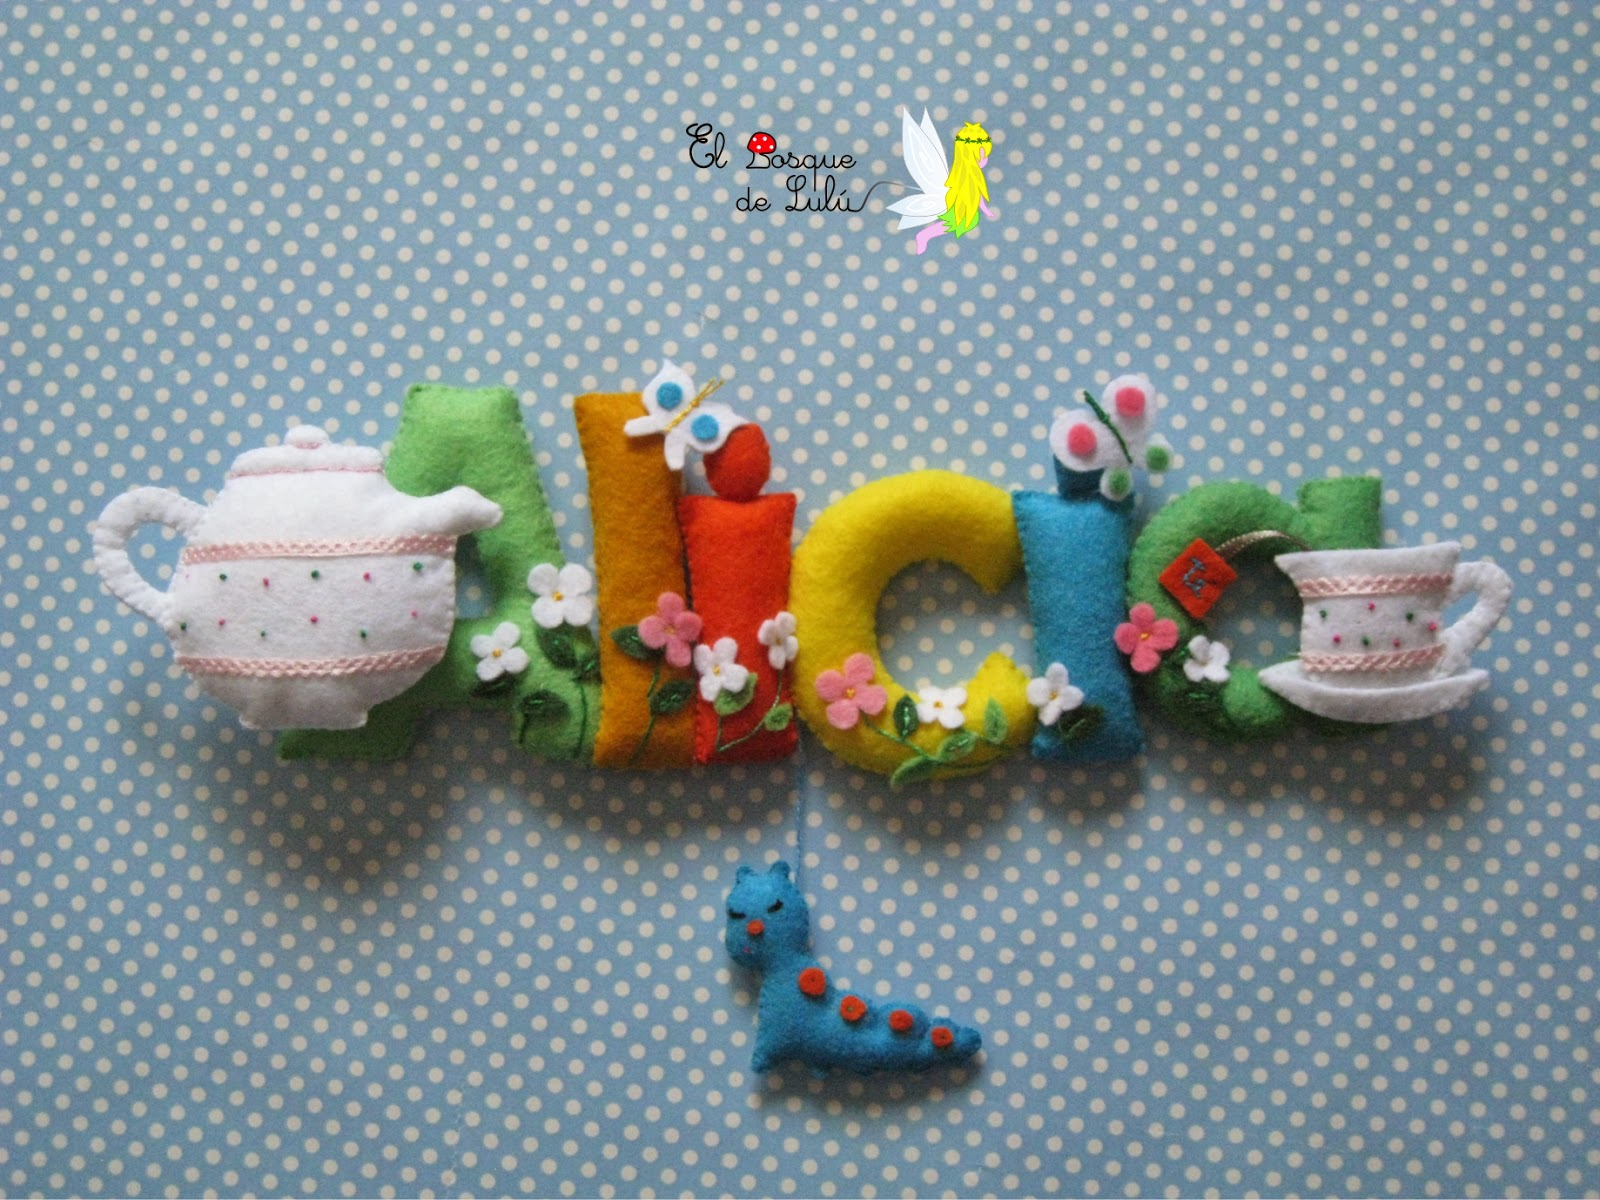 nombre-decorativo-fieltro-Alicia-tetera-te-personalizado-regalo